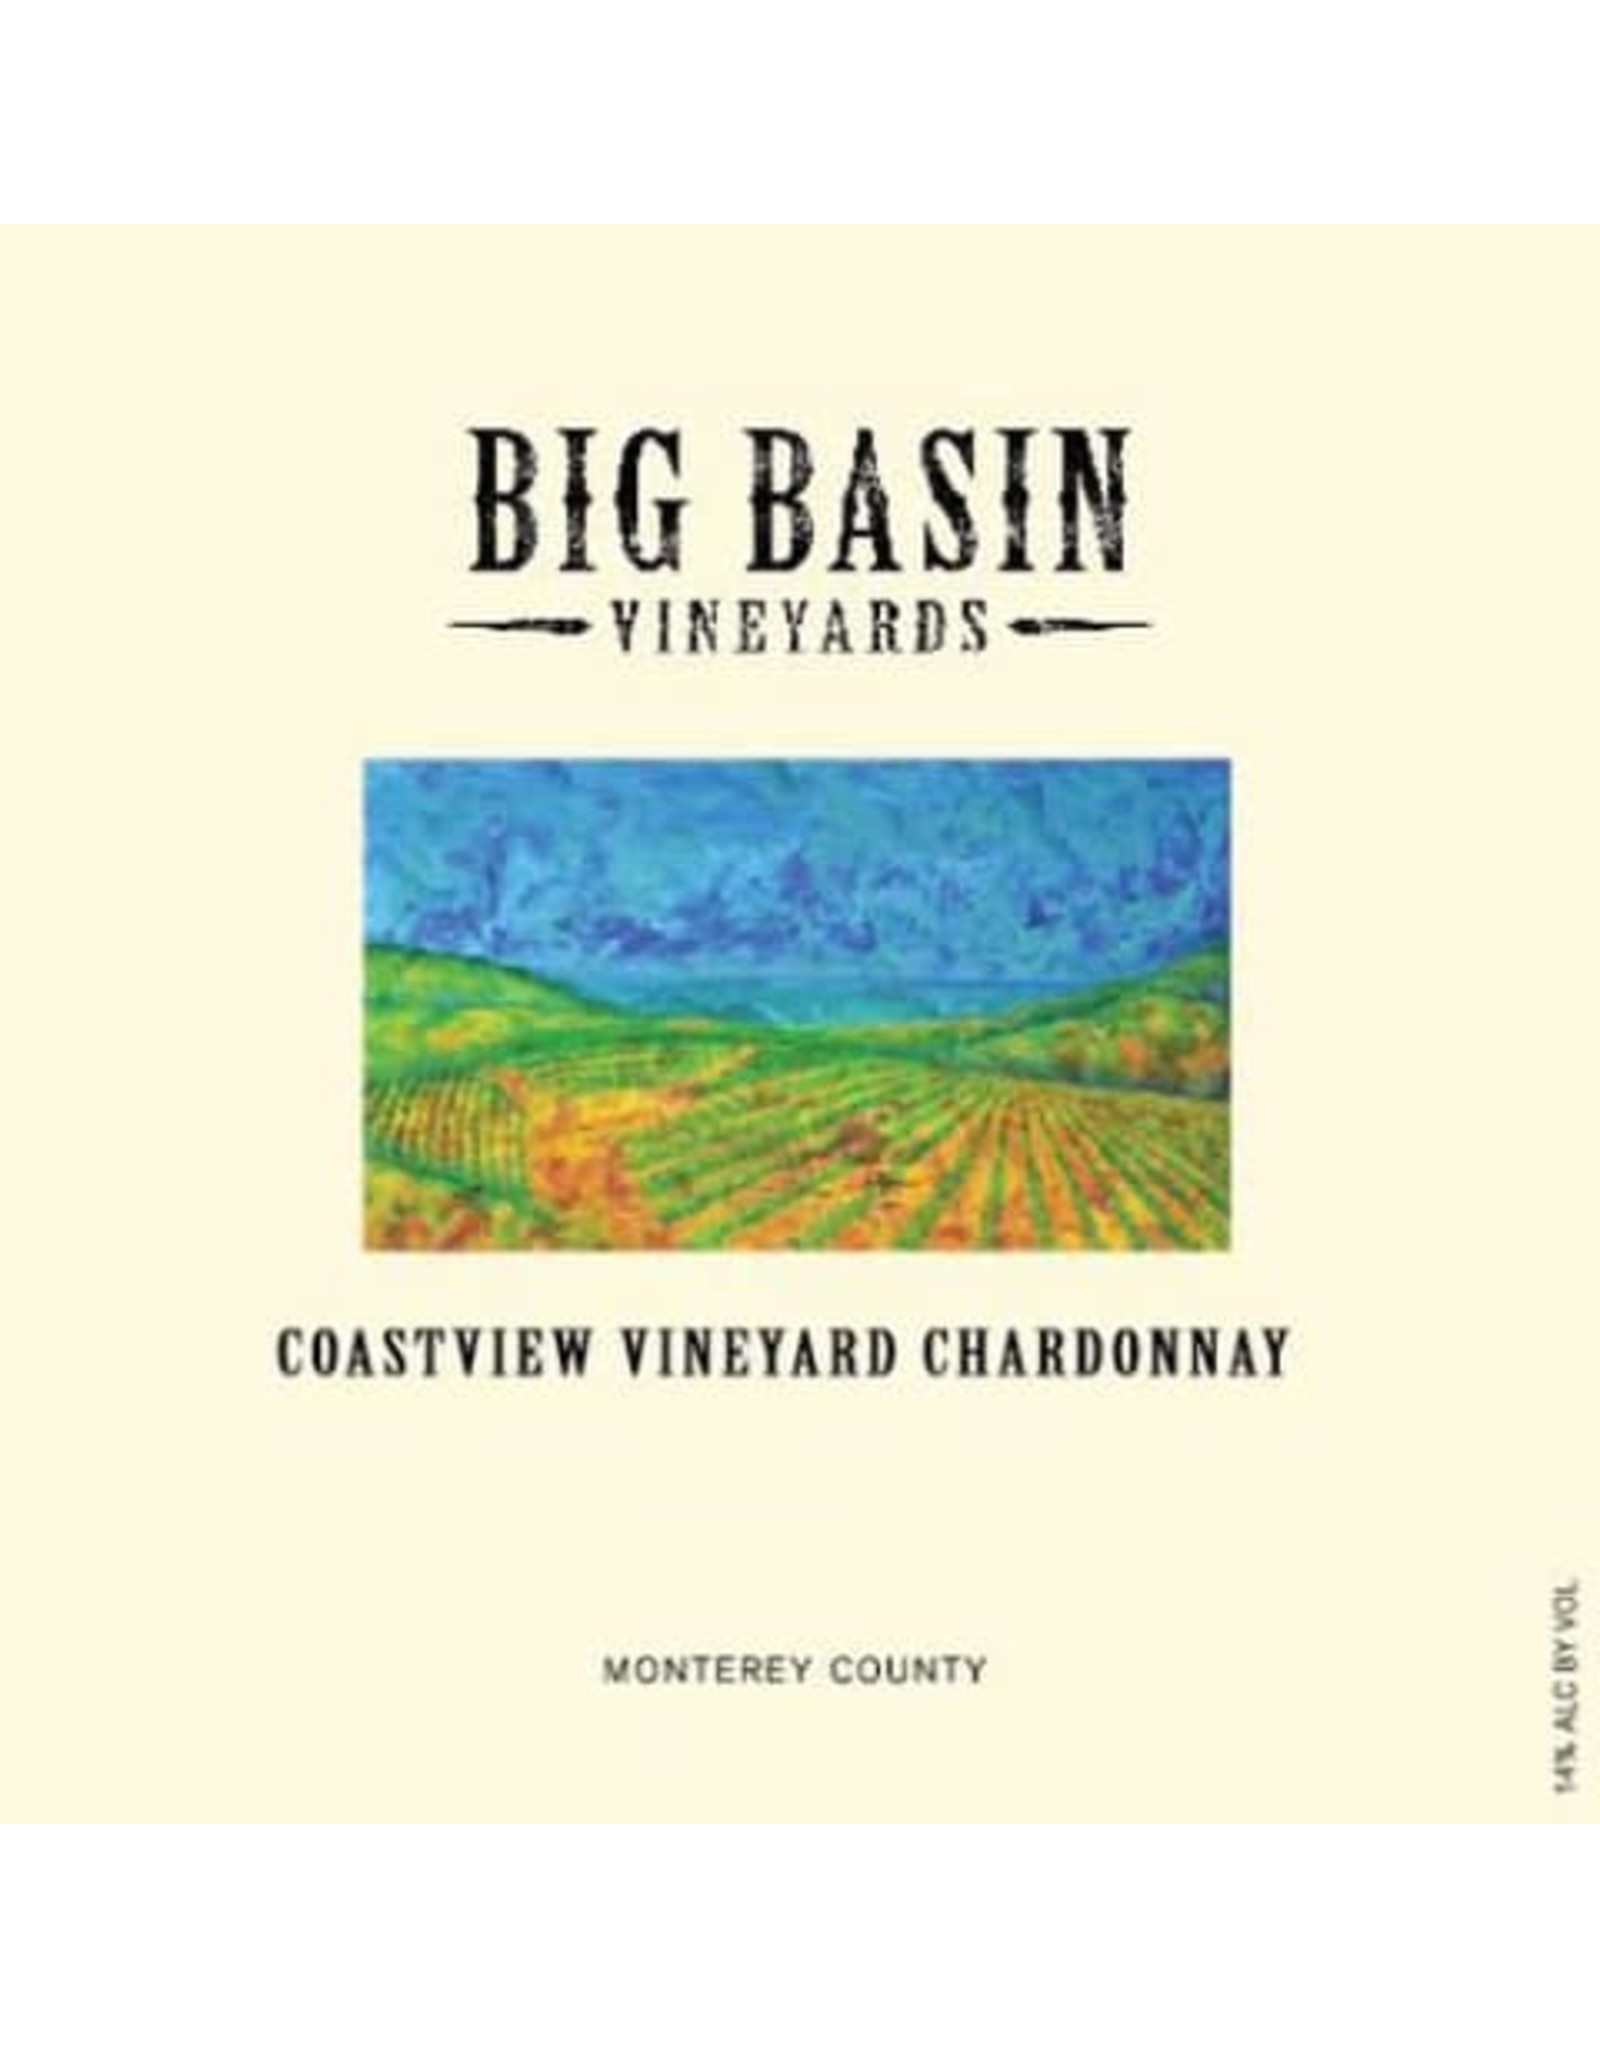 Big Basin Vineyards Monterey Chardonnay 2014